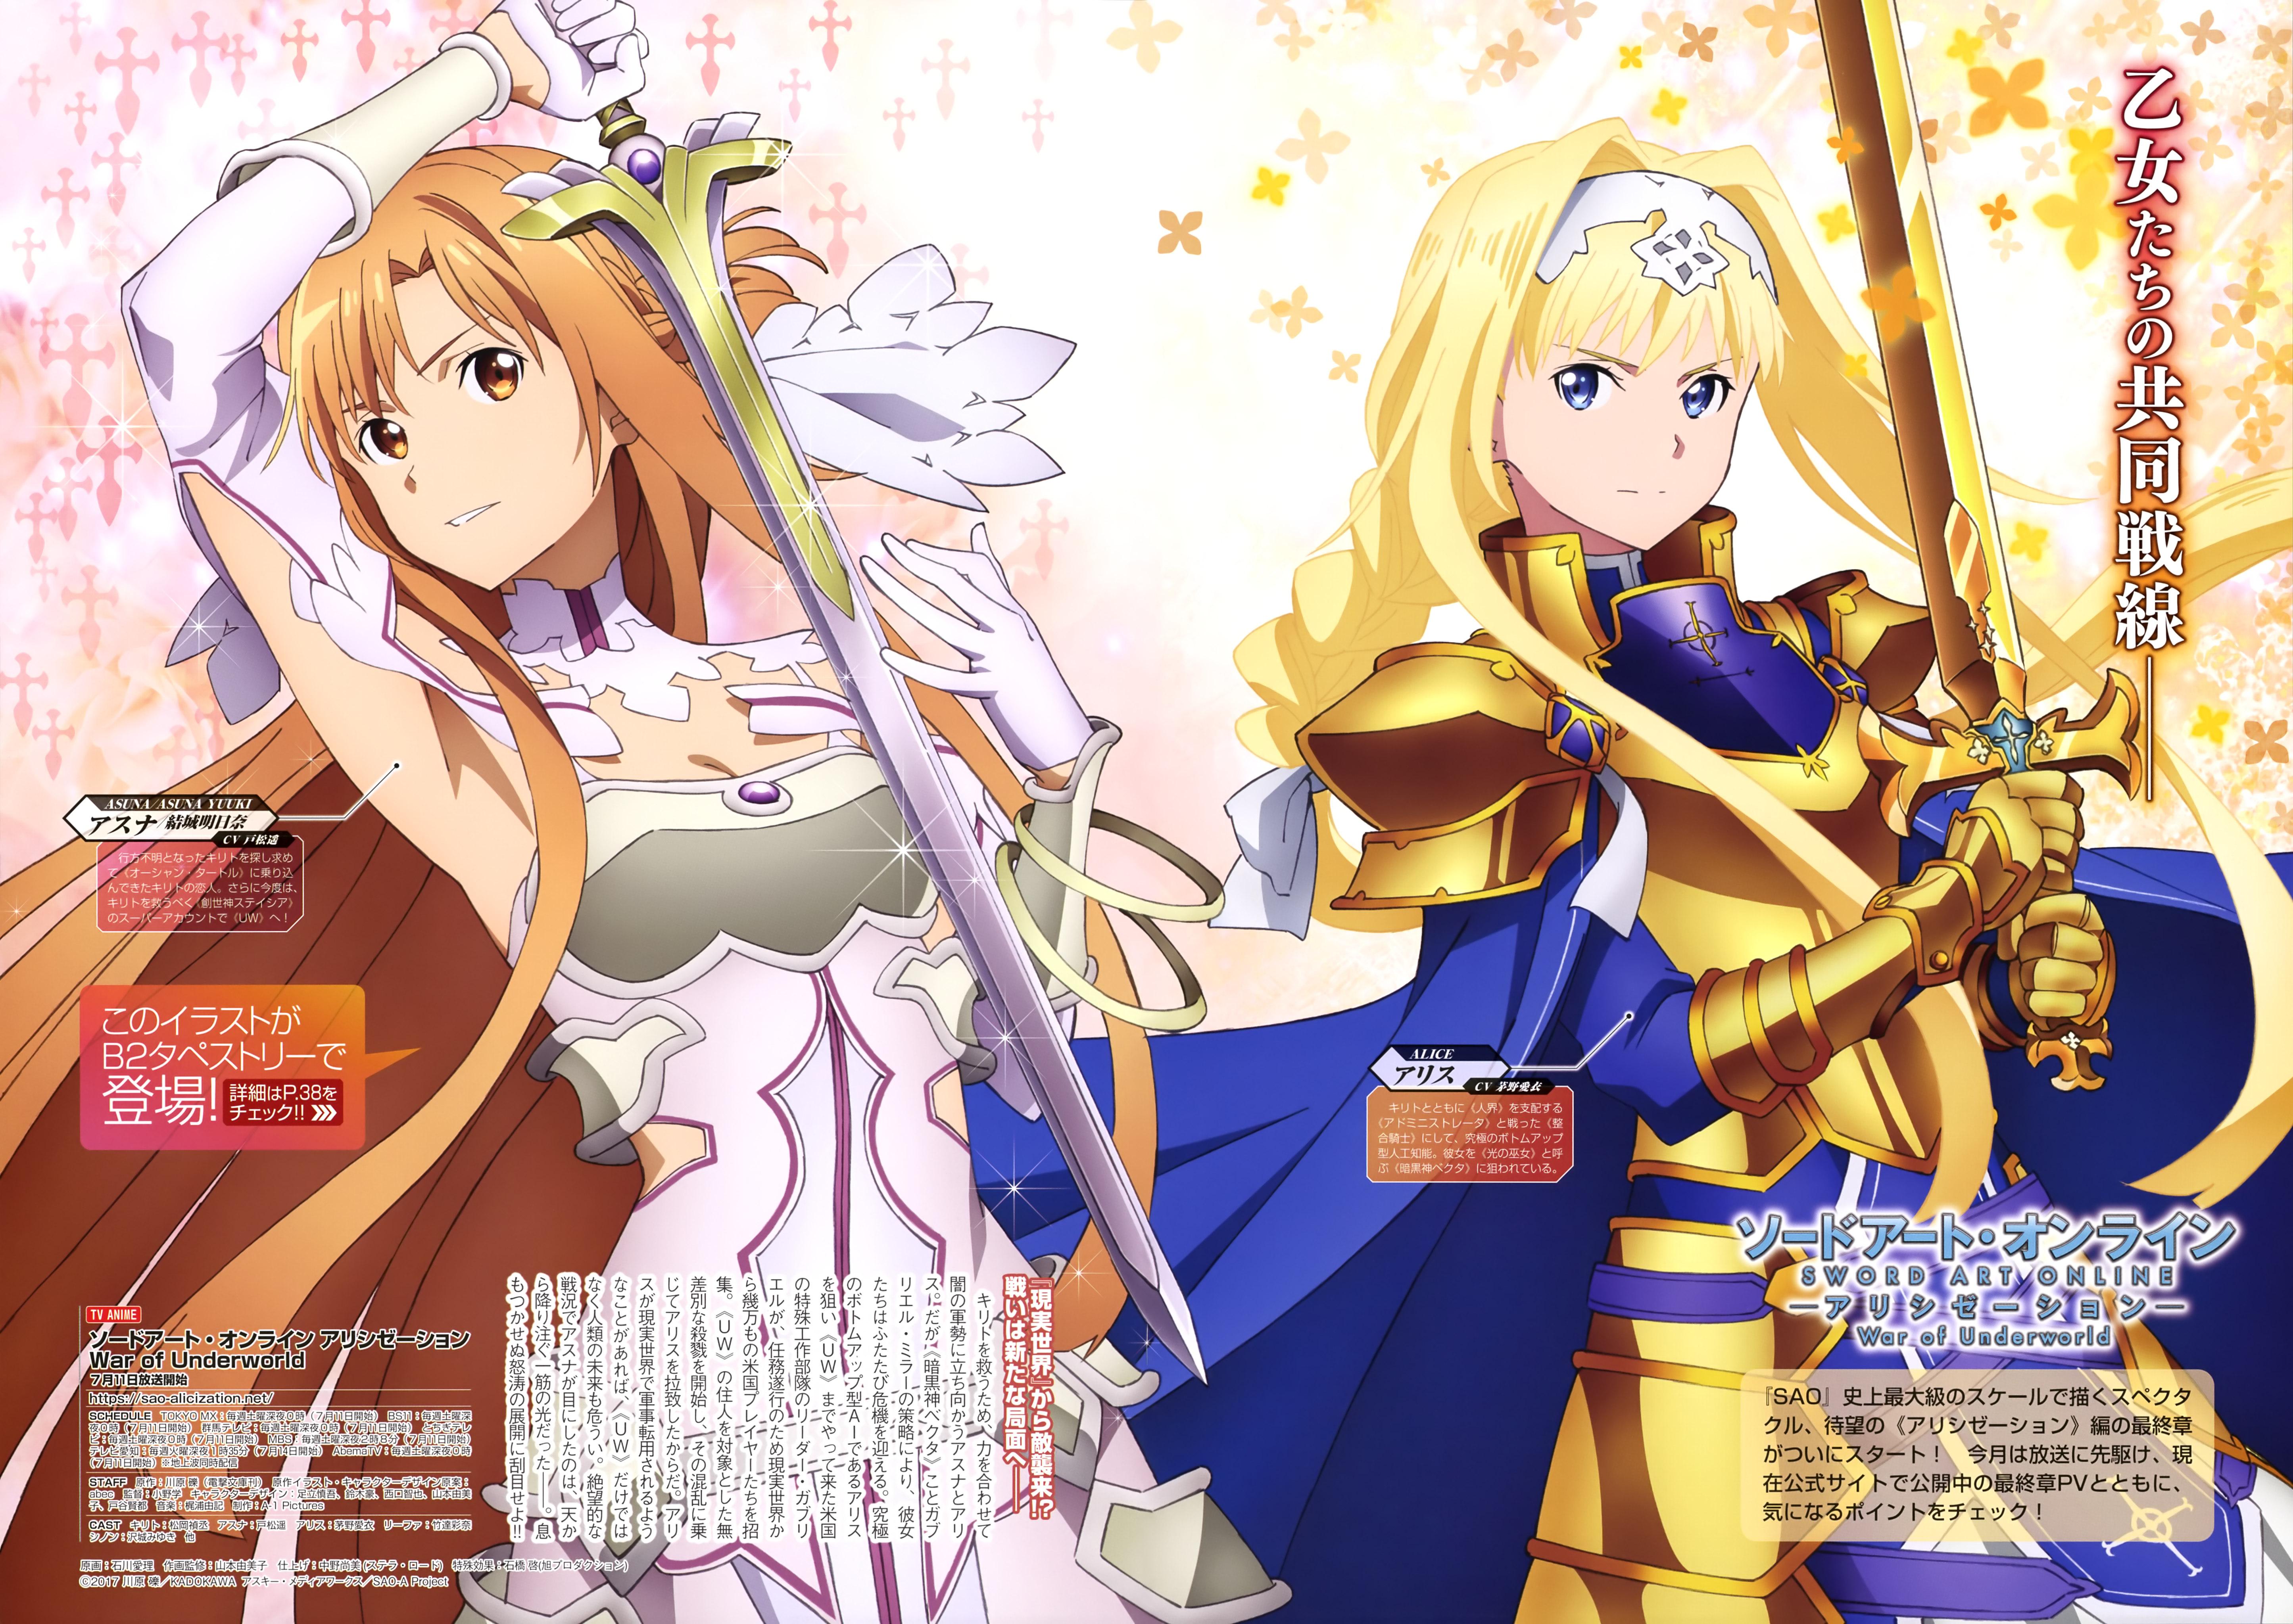 Sword Art Online Alicization War Of Underworld Image 2995550 Zerochan Anime Image Board